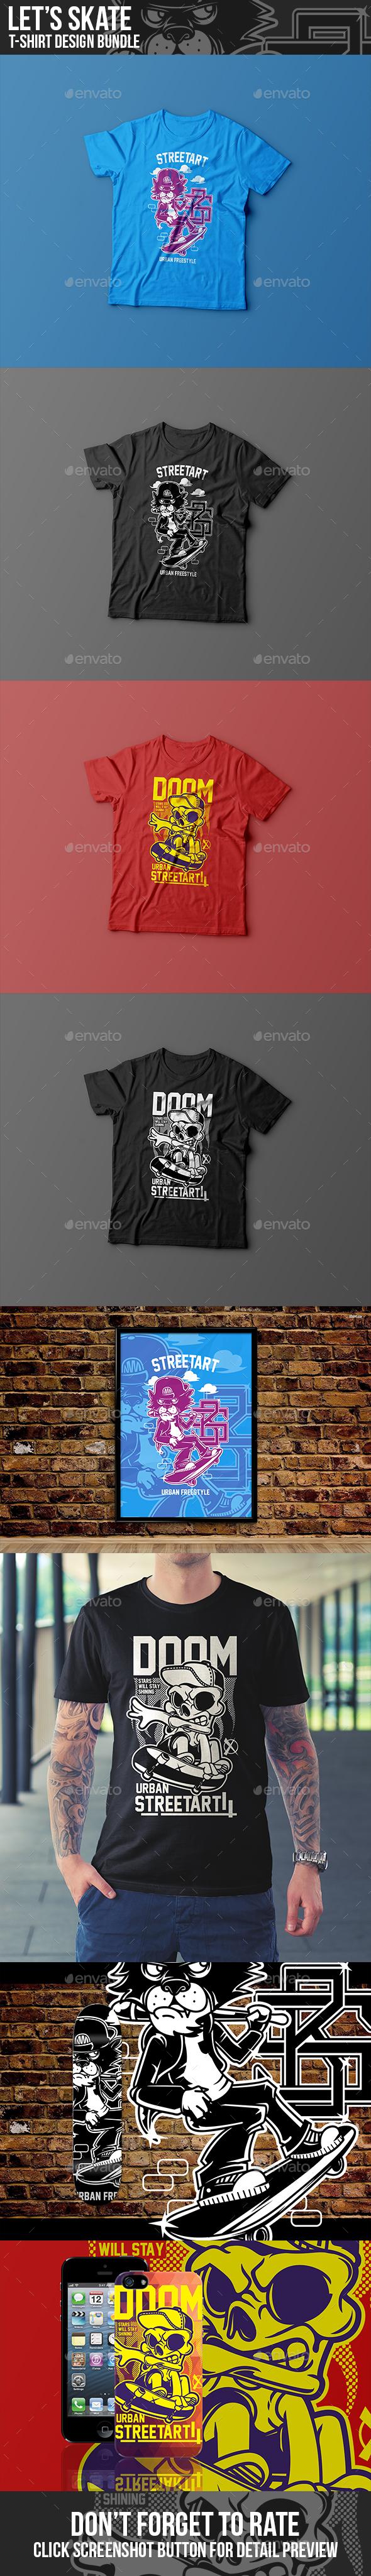 Shirt design eps - Robo With Football T Shirt Illustration Vector Eps Ai Design Download Http Graphicriver Net Item Robo With Football Tshirt Design 13213095 Ref